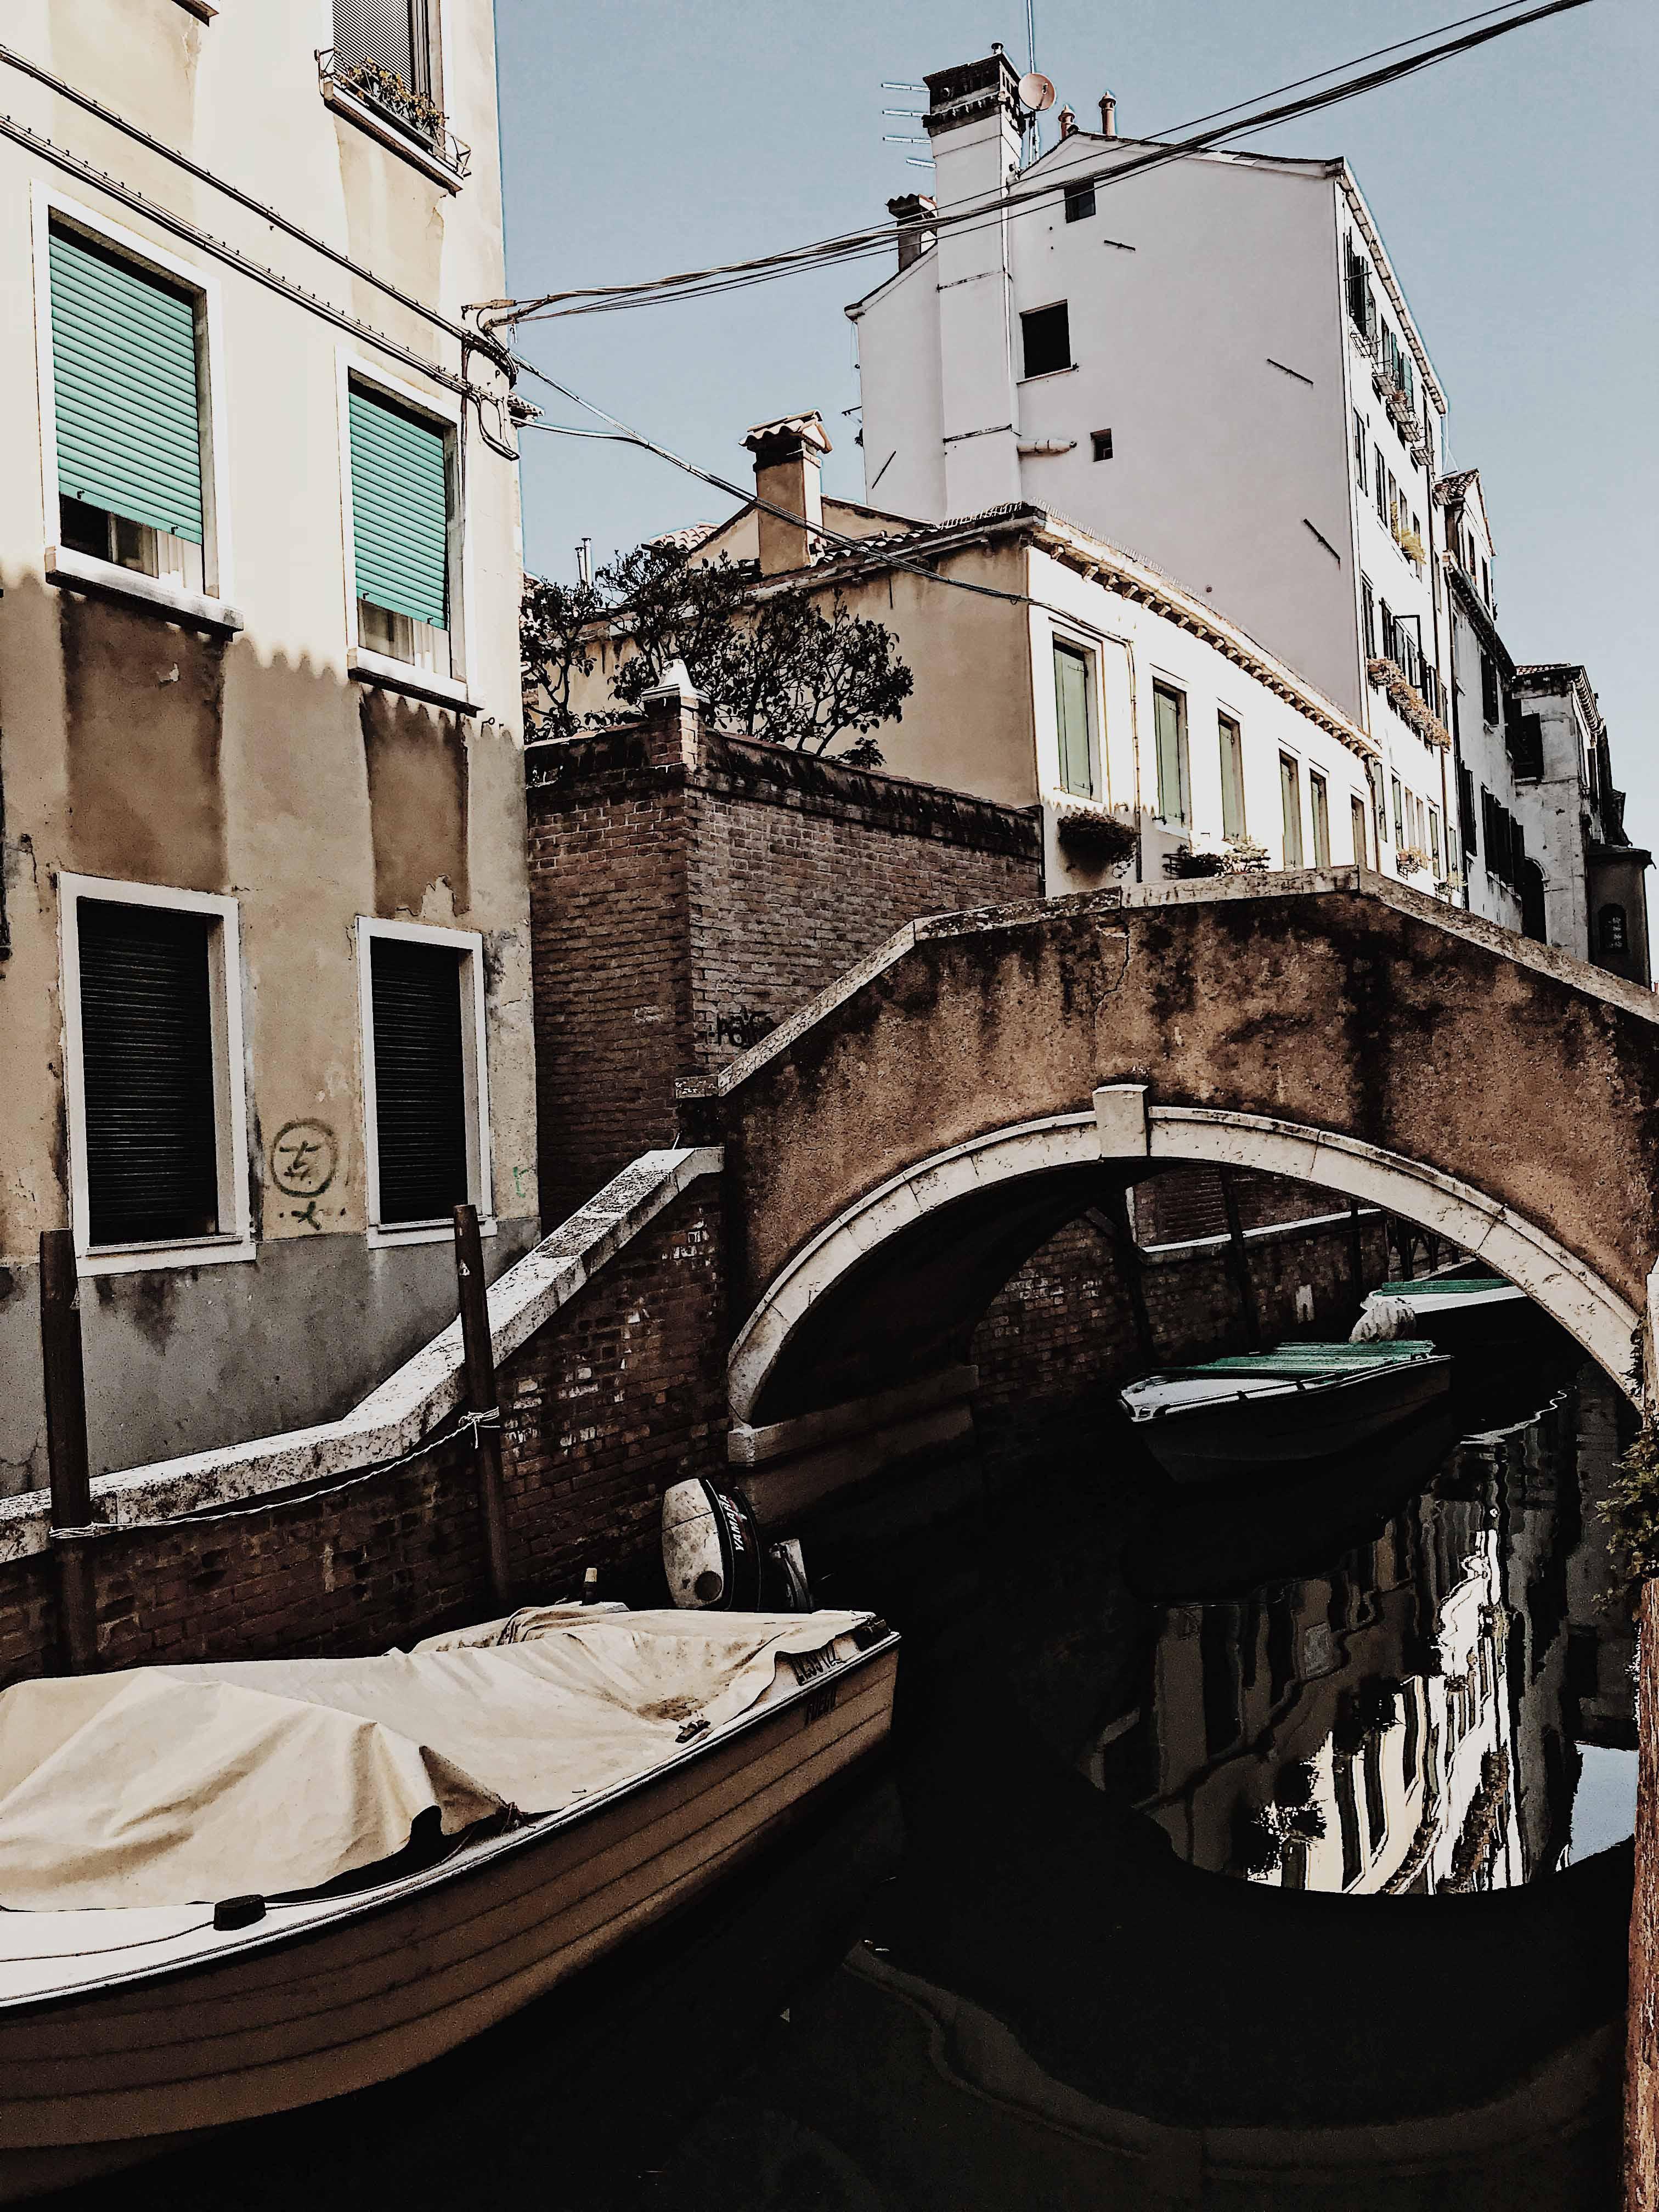 Bridge of Tits in Venice, Italy